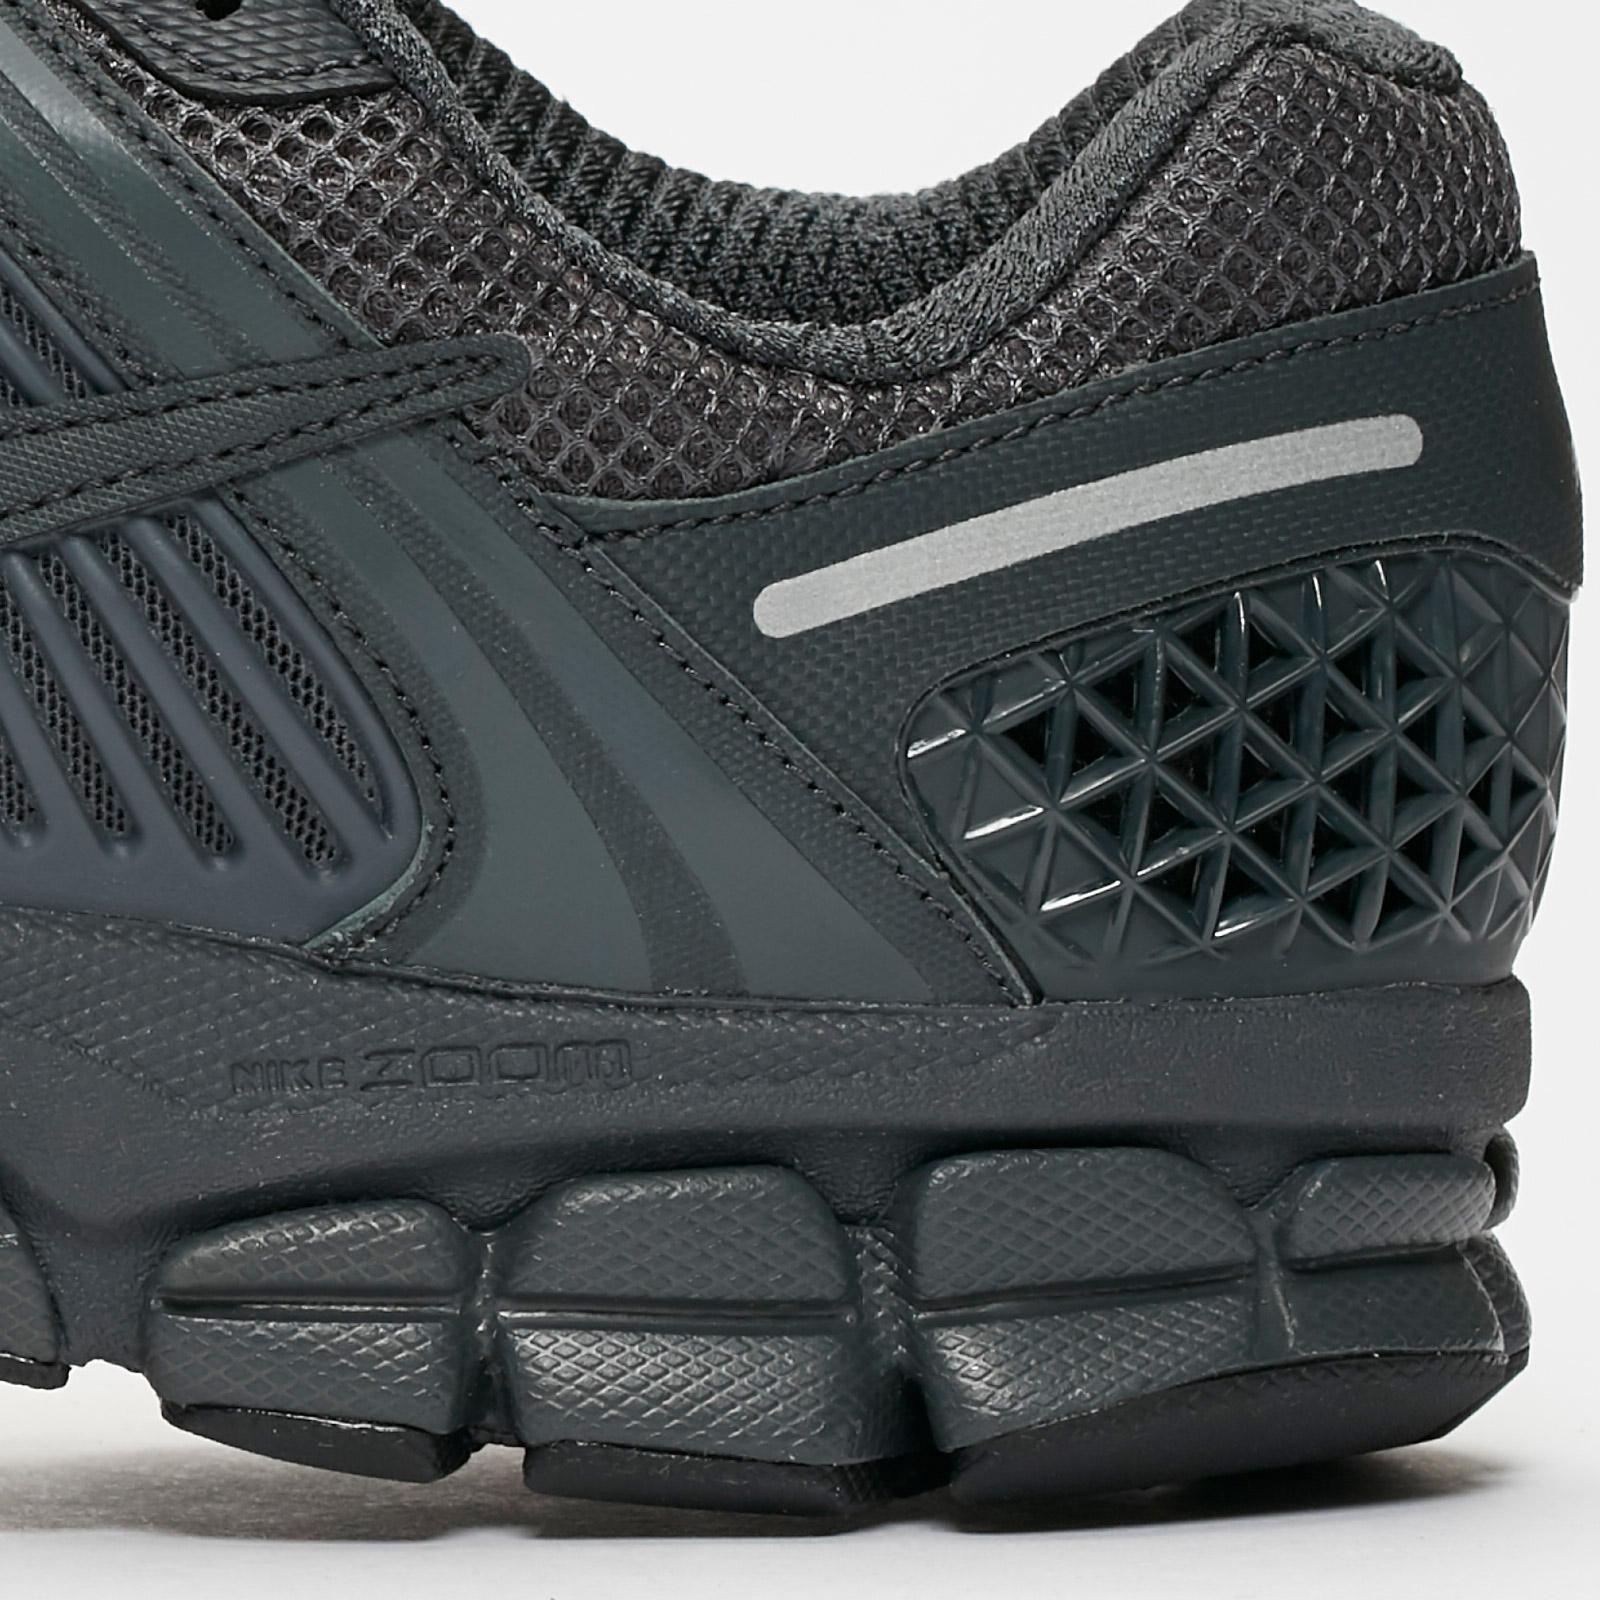 pick up 24029 5a4ec NikeLab Zoom Vomero 5 SP - 7. Close